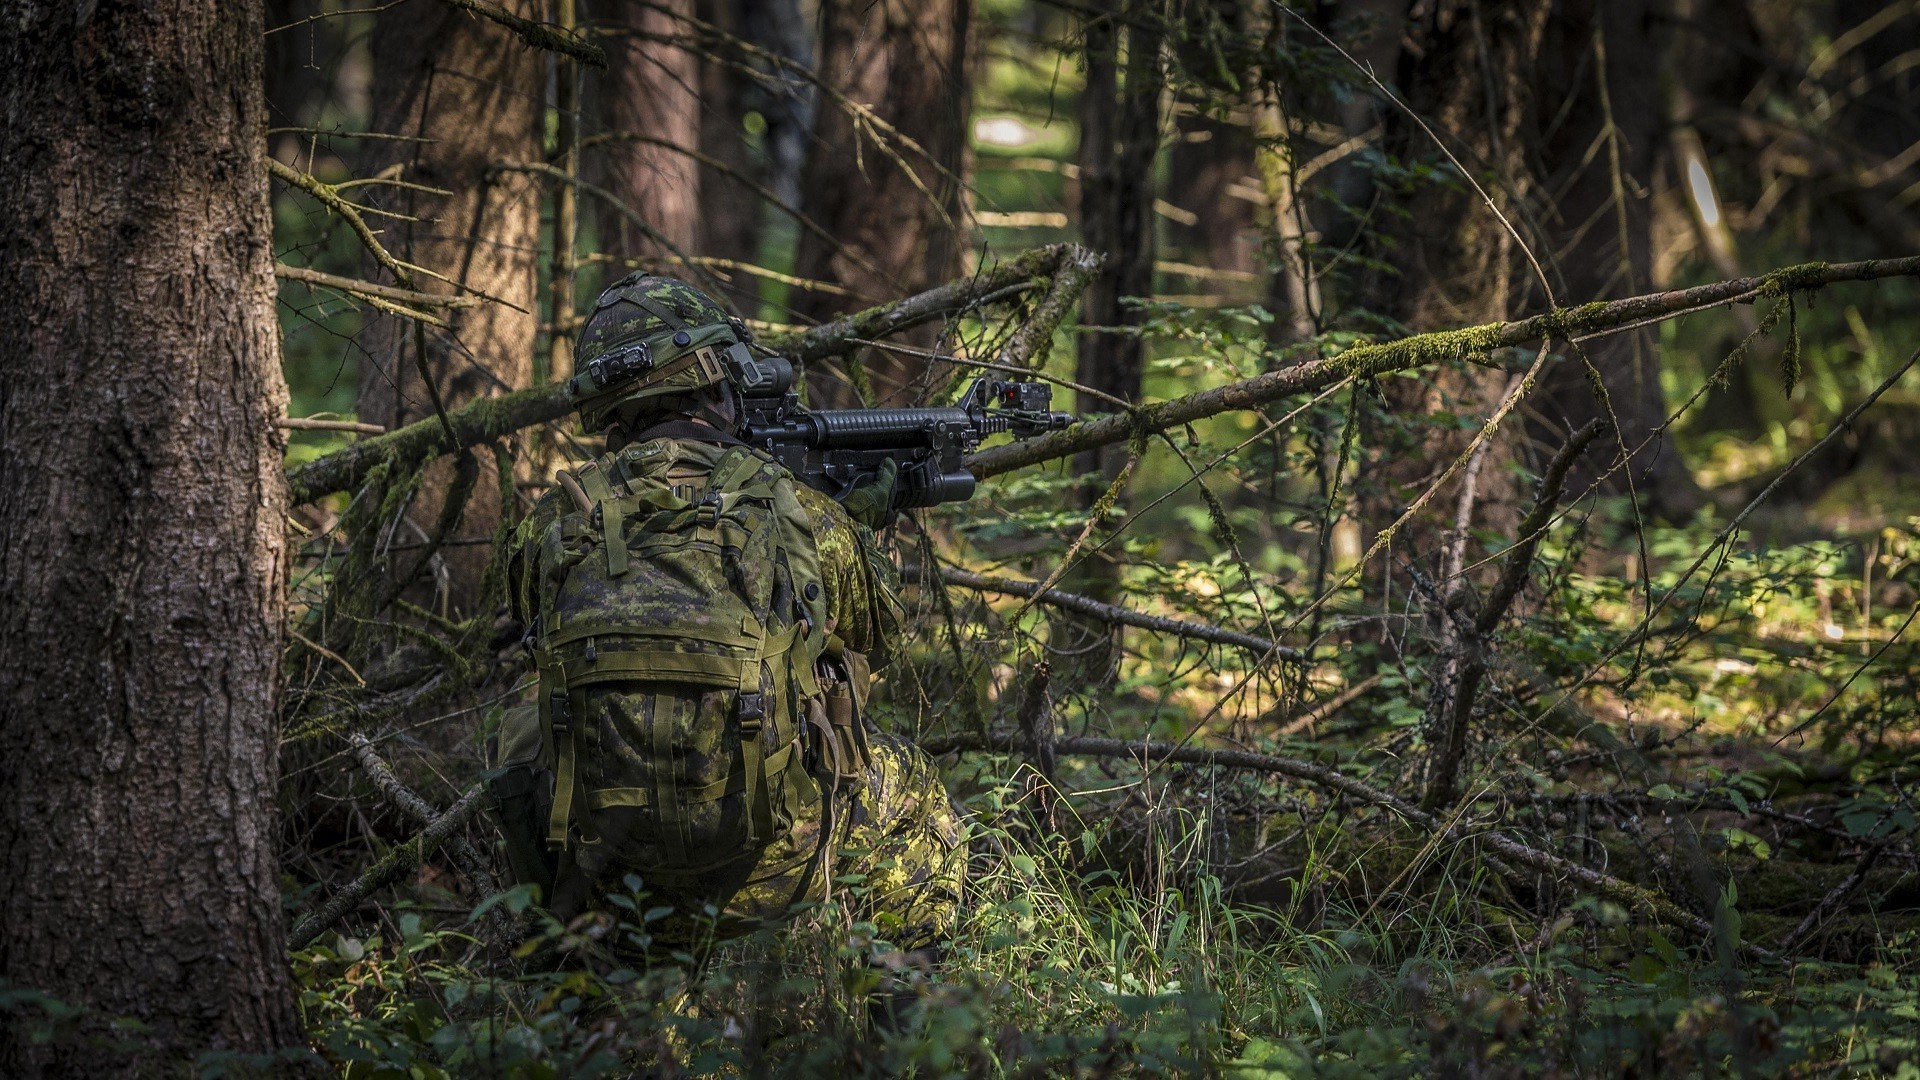 Army Camo Wallpaper: Woodland Camo Wallpaper ·①